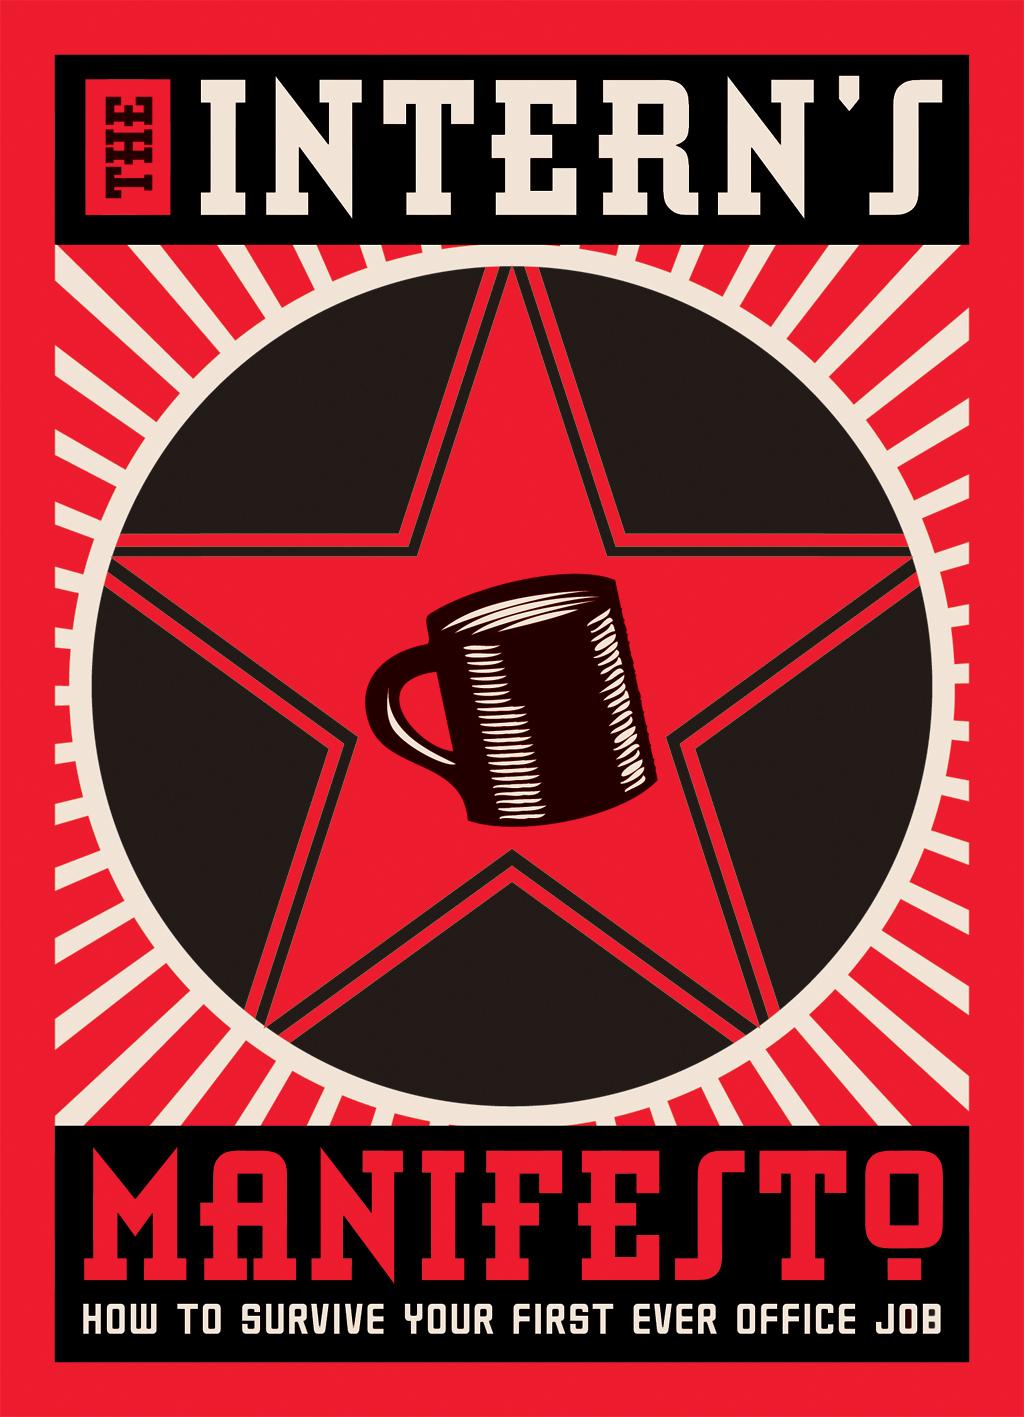 The Intern's Manifesto